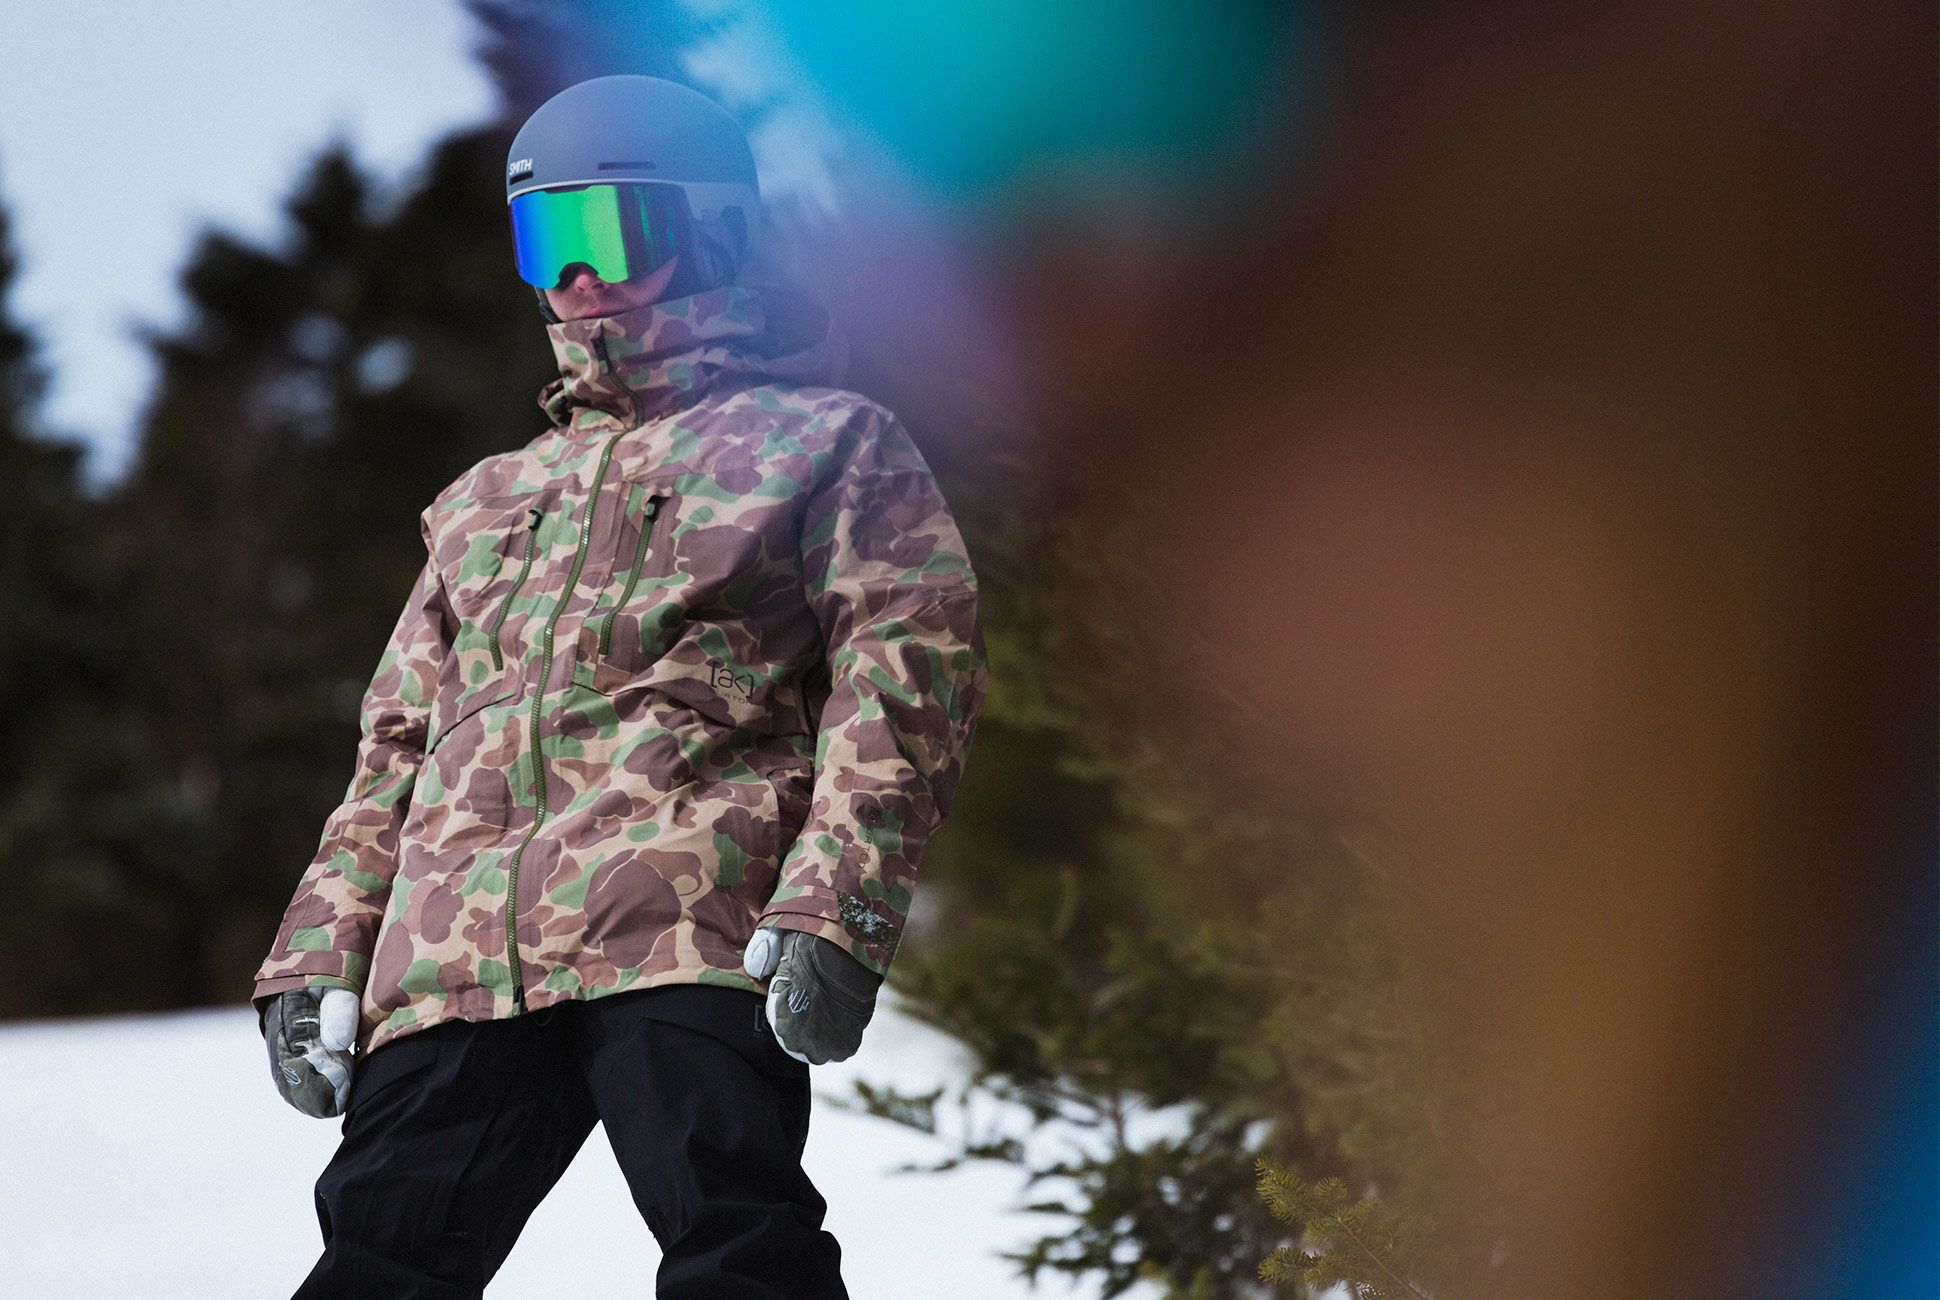 ultimate-ski-and-snow-gear-patrol-burton-slide-1